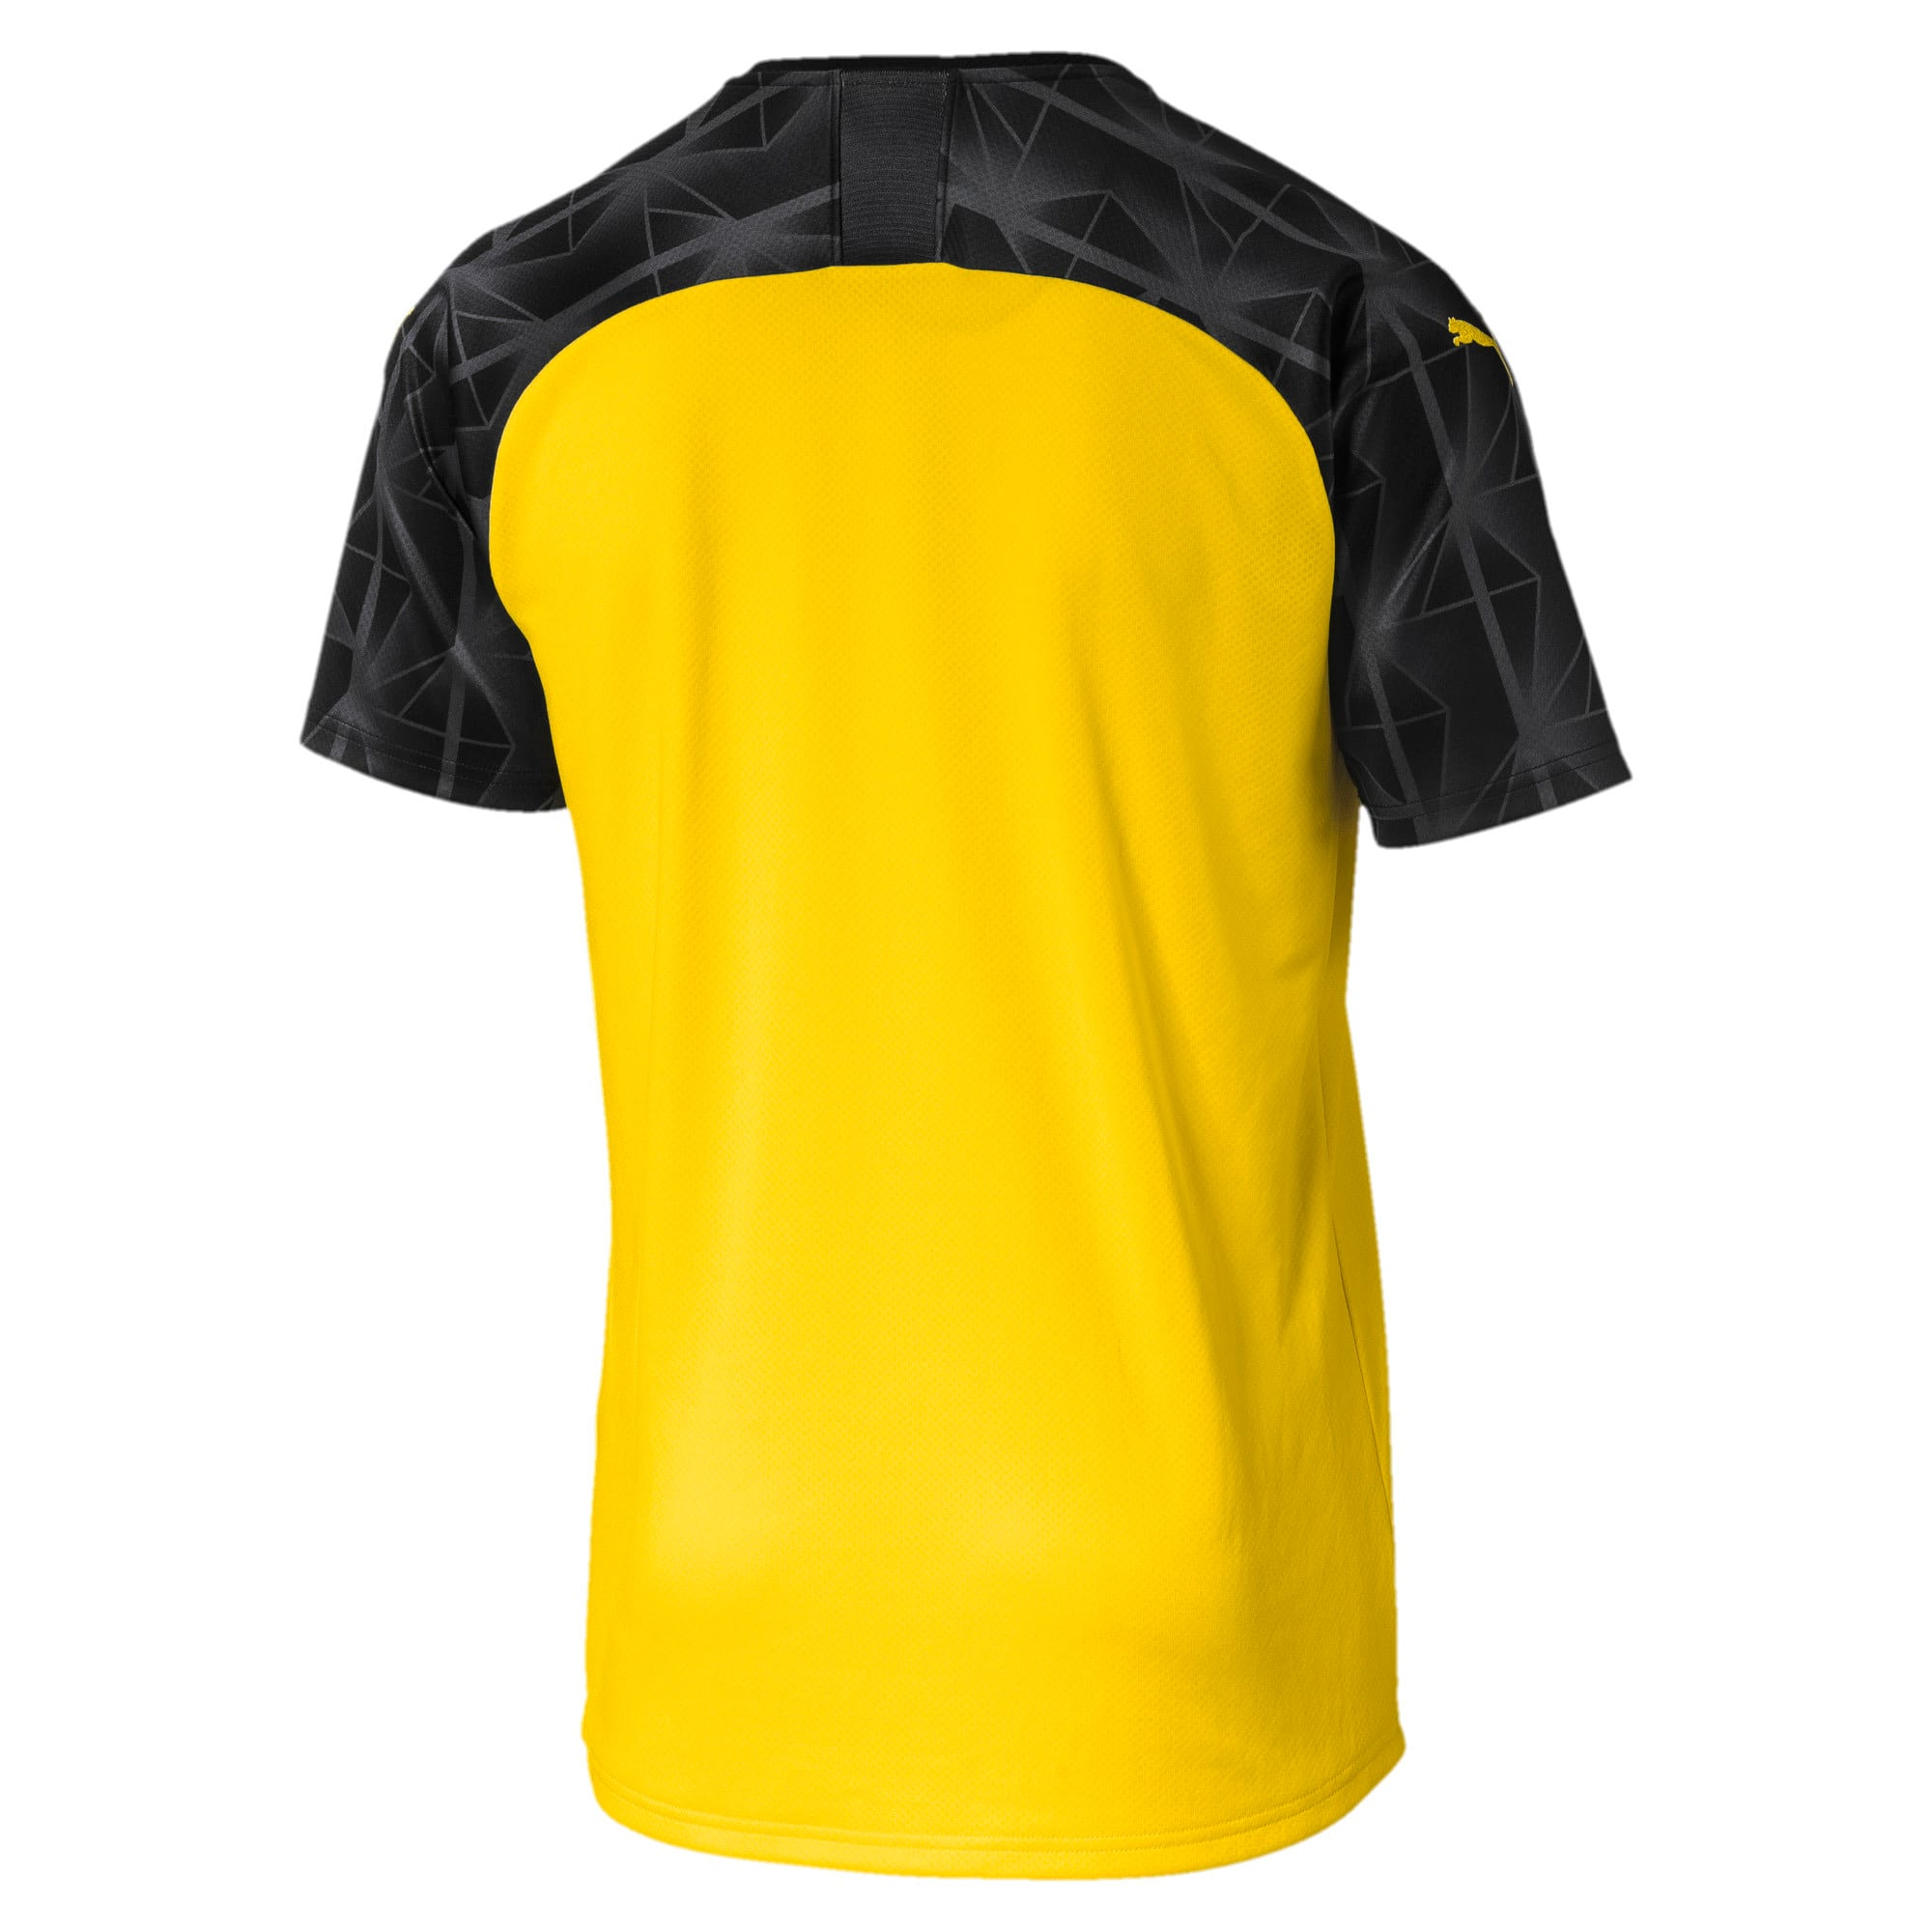 Thumbnail 2 of BVB Men's Replica Cup Jersey, Cyber Yellow-Puma Black, medium